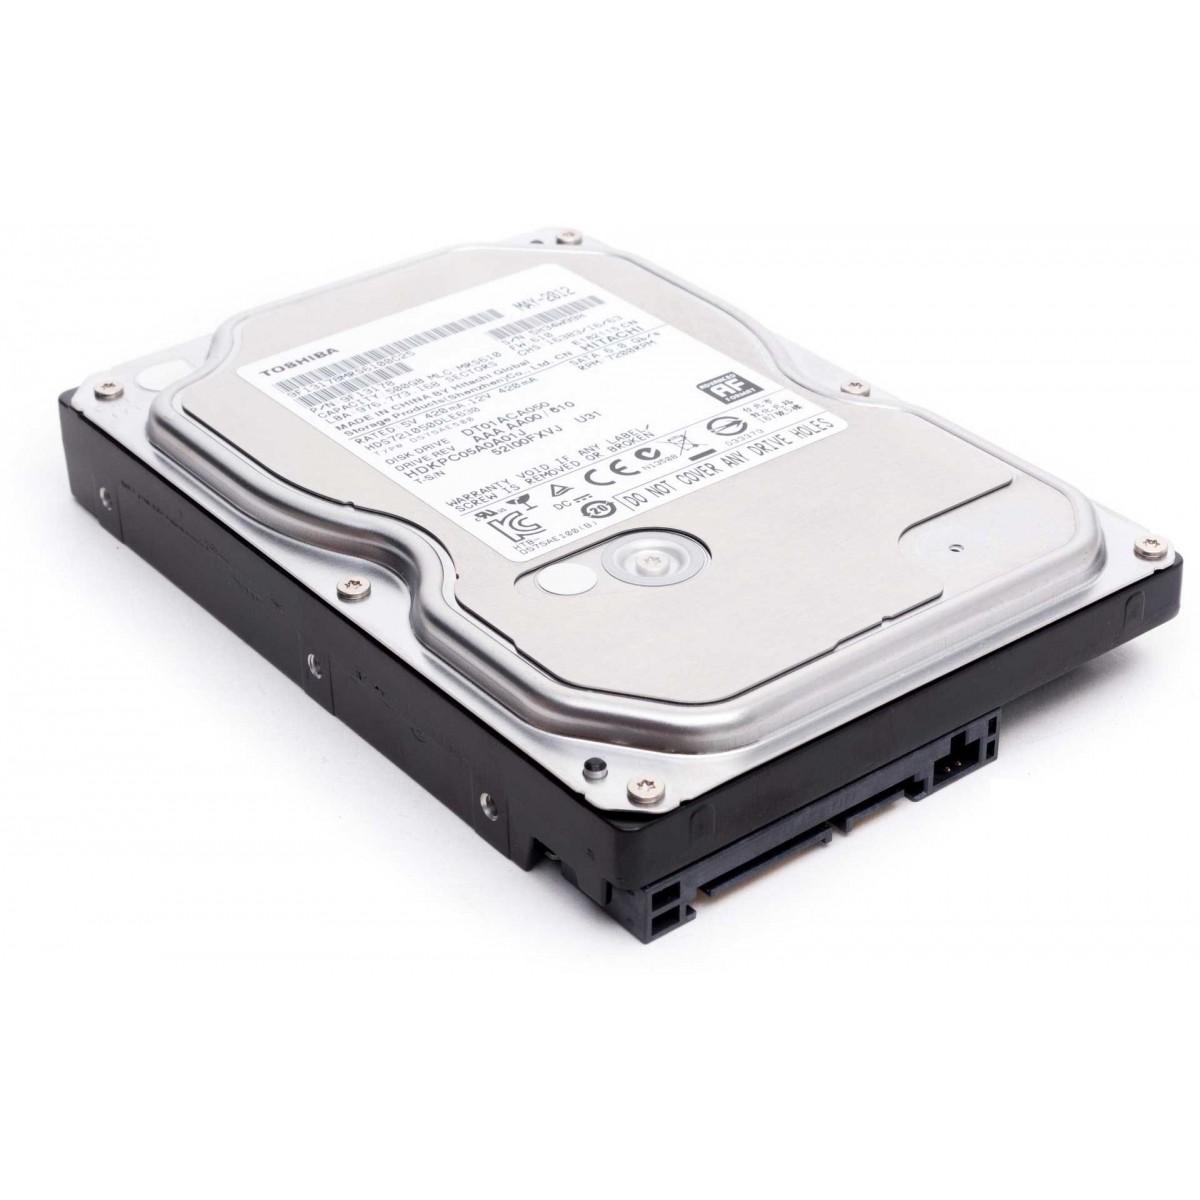 Hd 2Tb Sata Toshiba  6Gb| S 7200Rpm